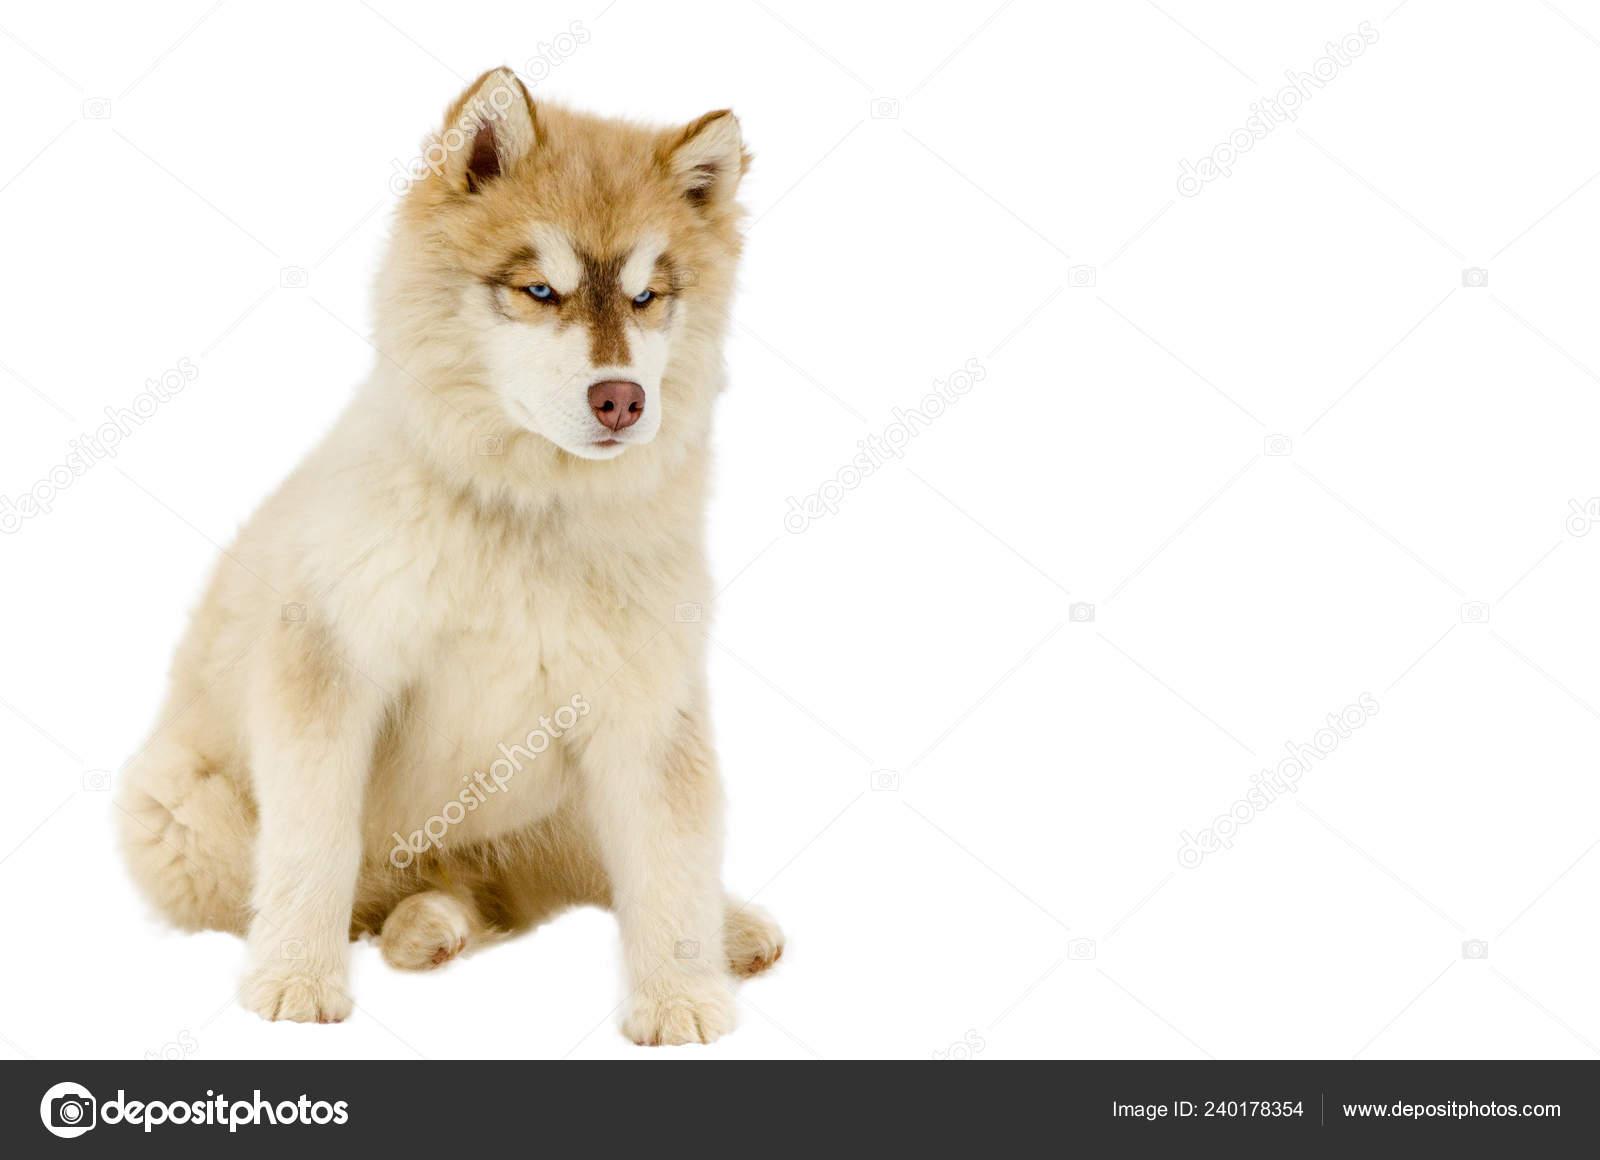 One Puppy Siberian Husky Dog Blue Eyes Looks Husky Breed